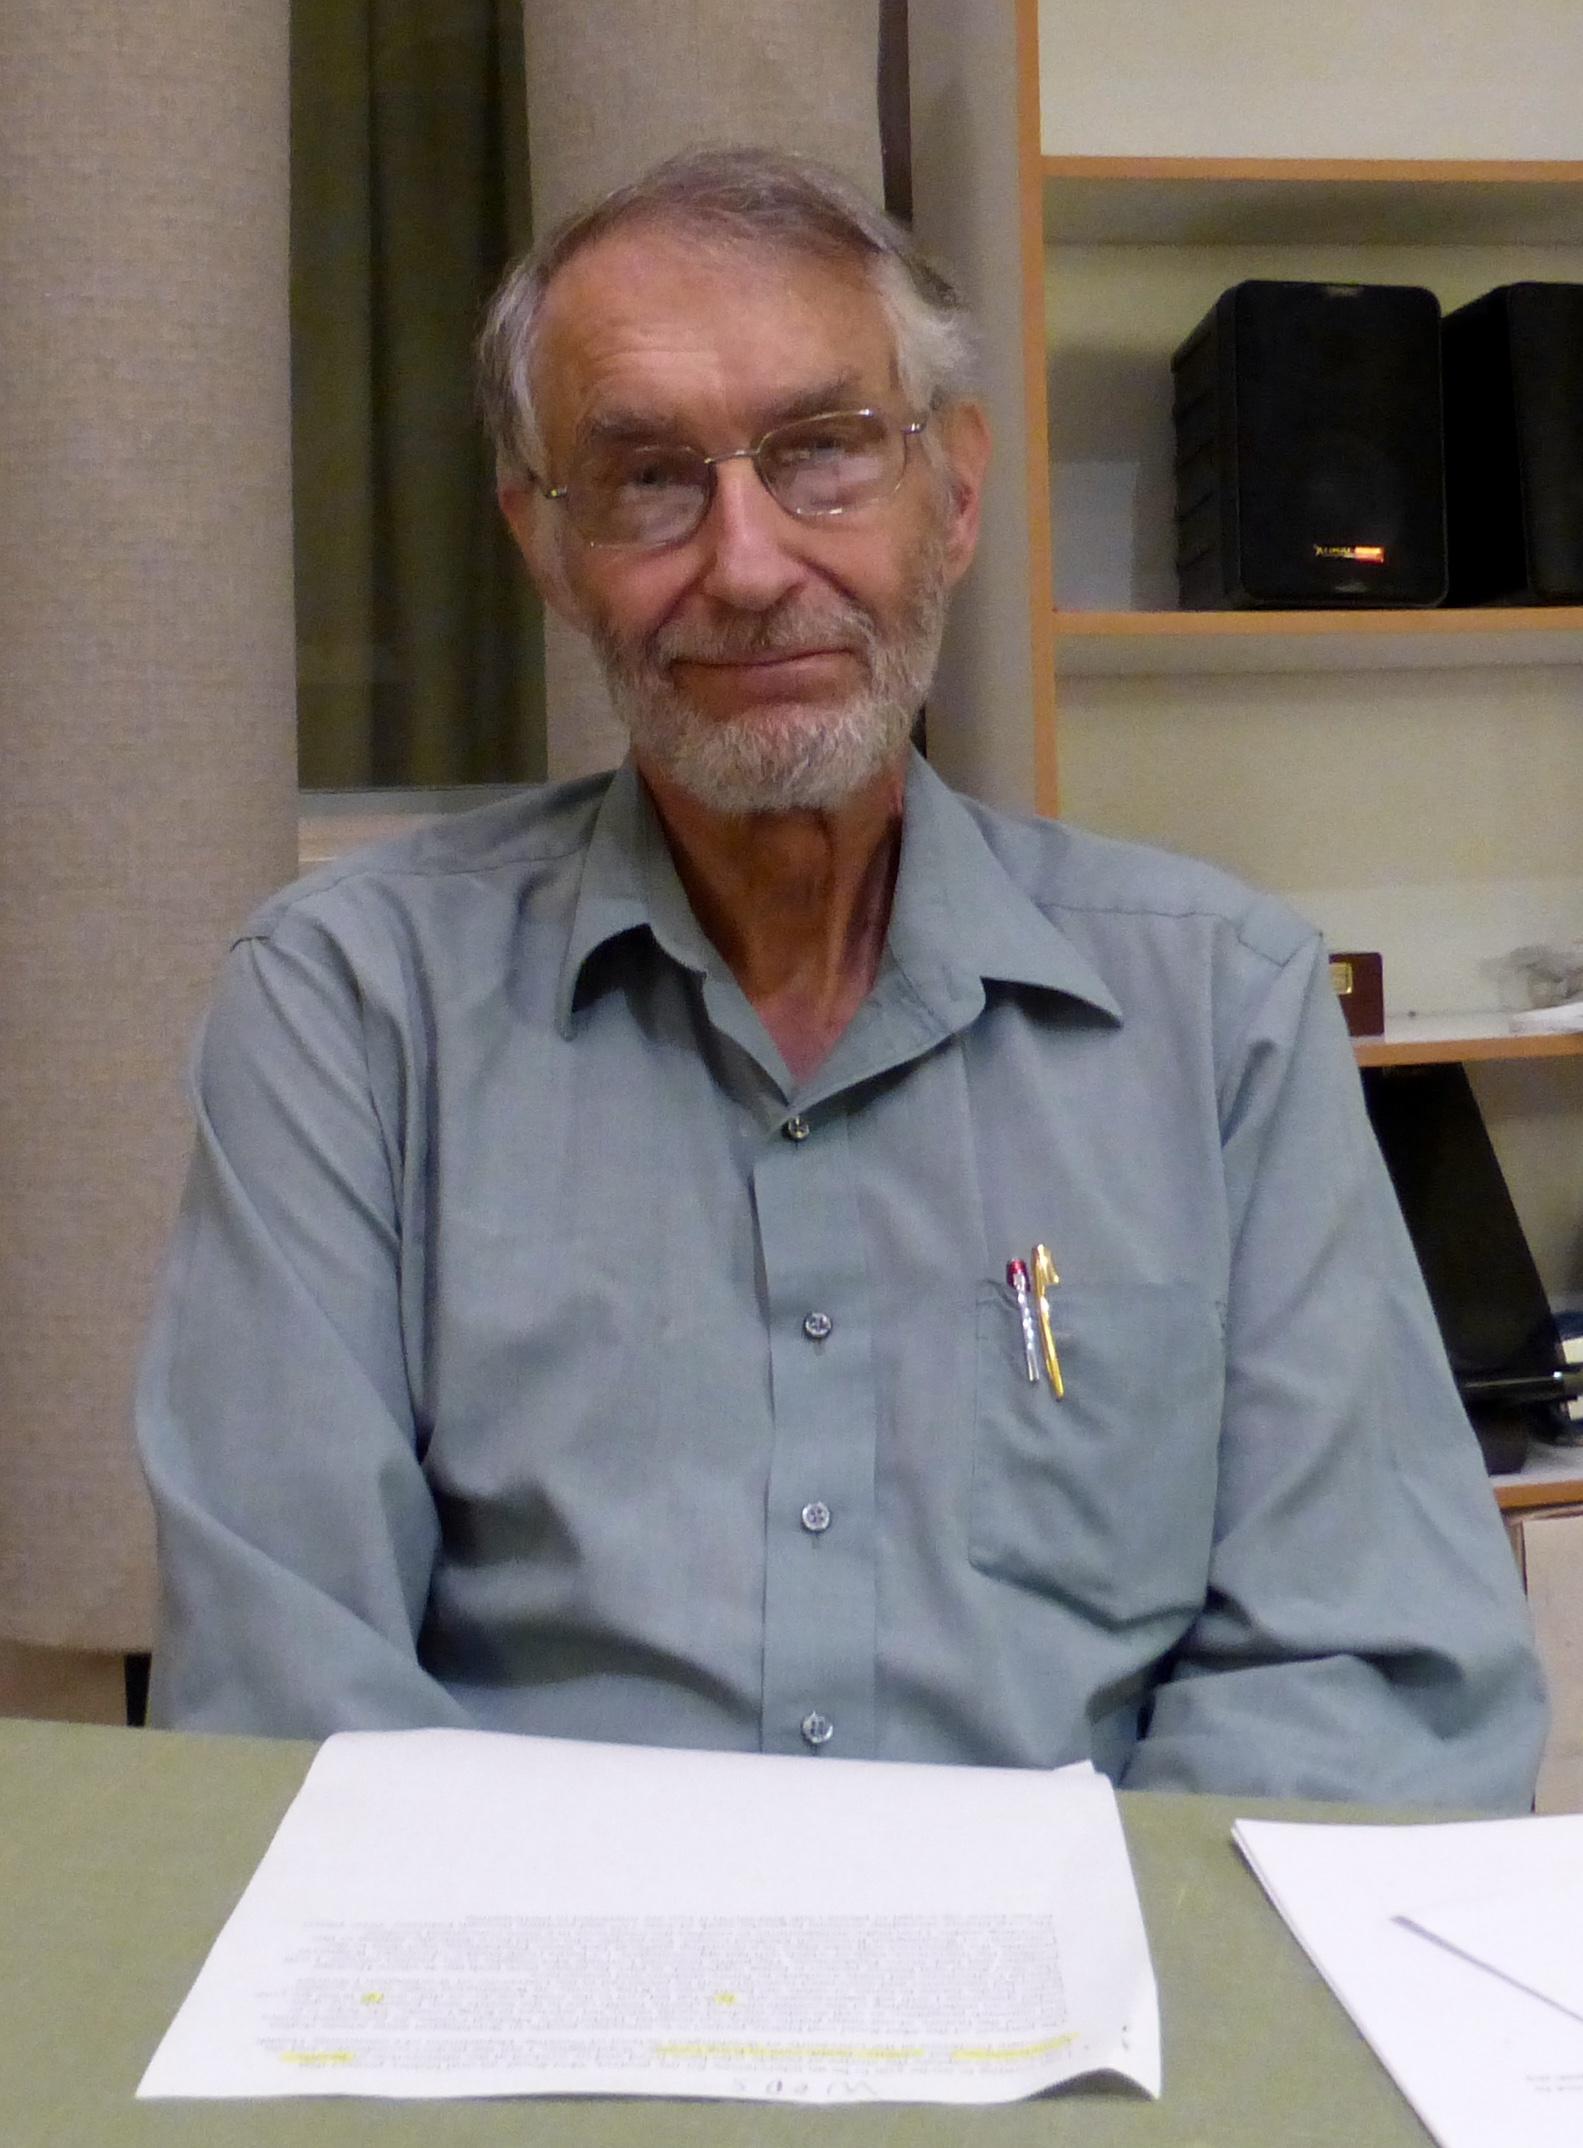 Stephen Bezruchka, MD